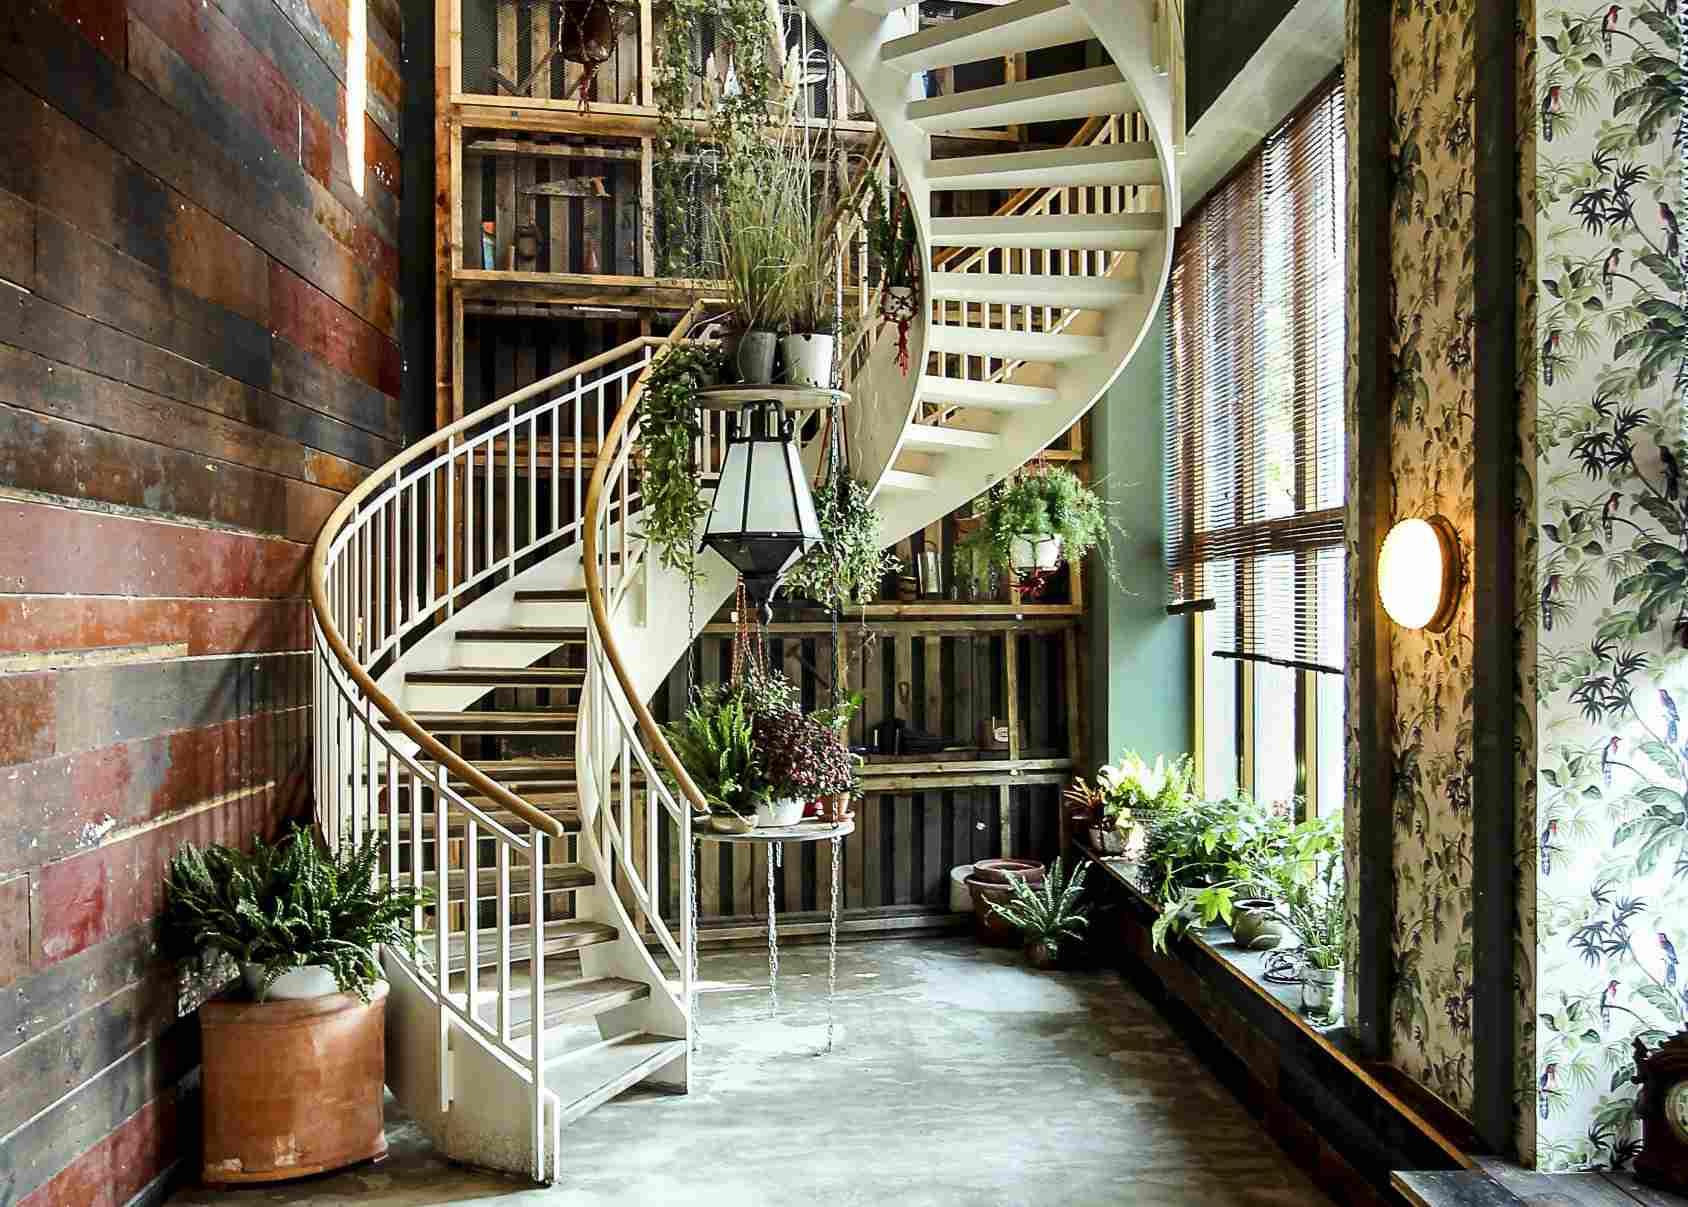 House of Small Wonders in Berlin